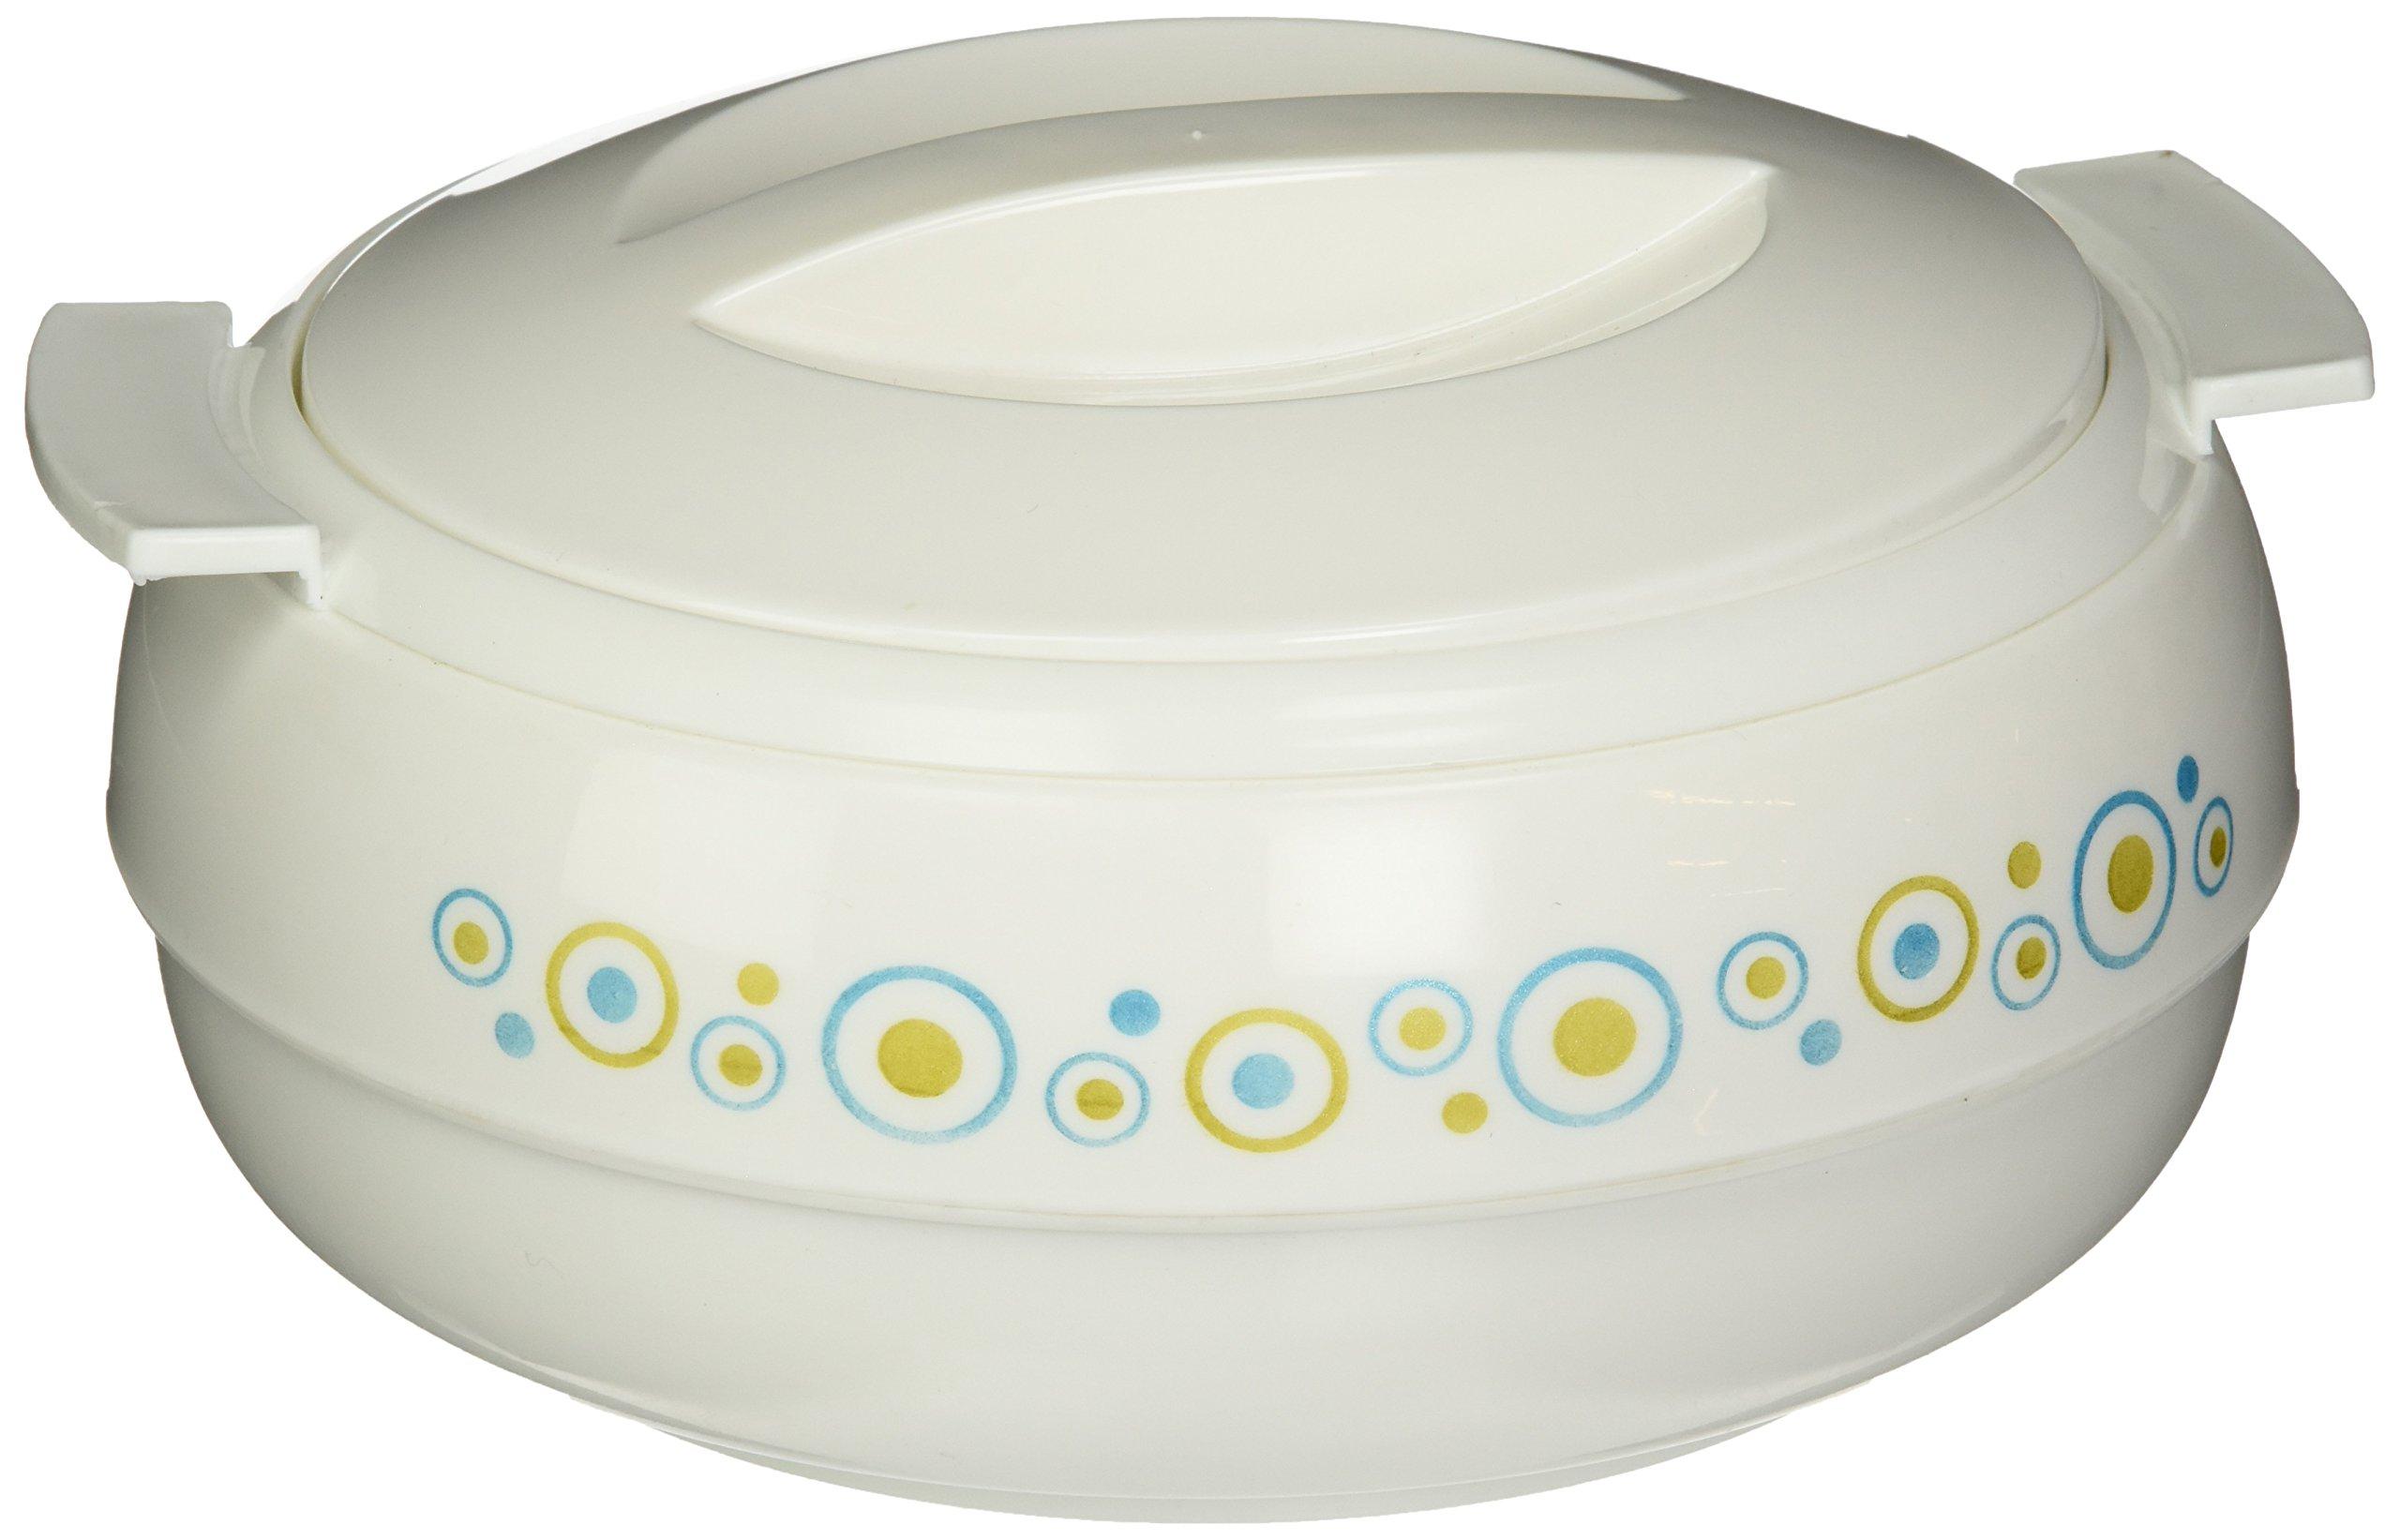 Cello Ornate Hot-Pot Insulated Casserole Food Warmer/Cooler, 1.7-Liter